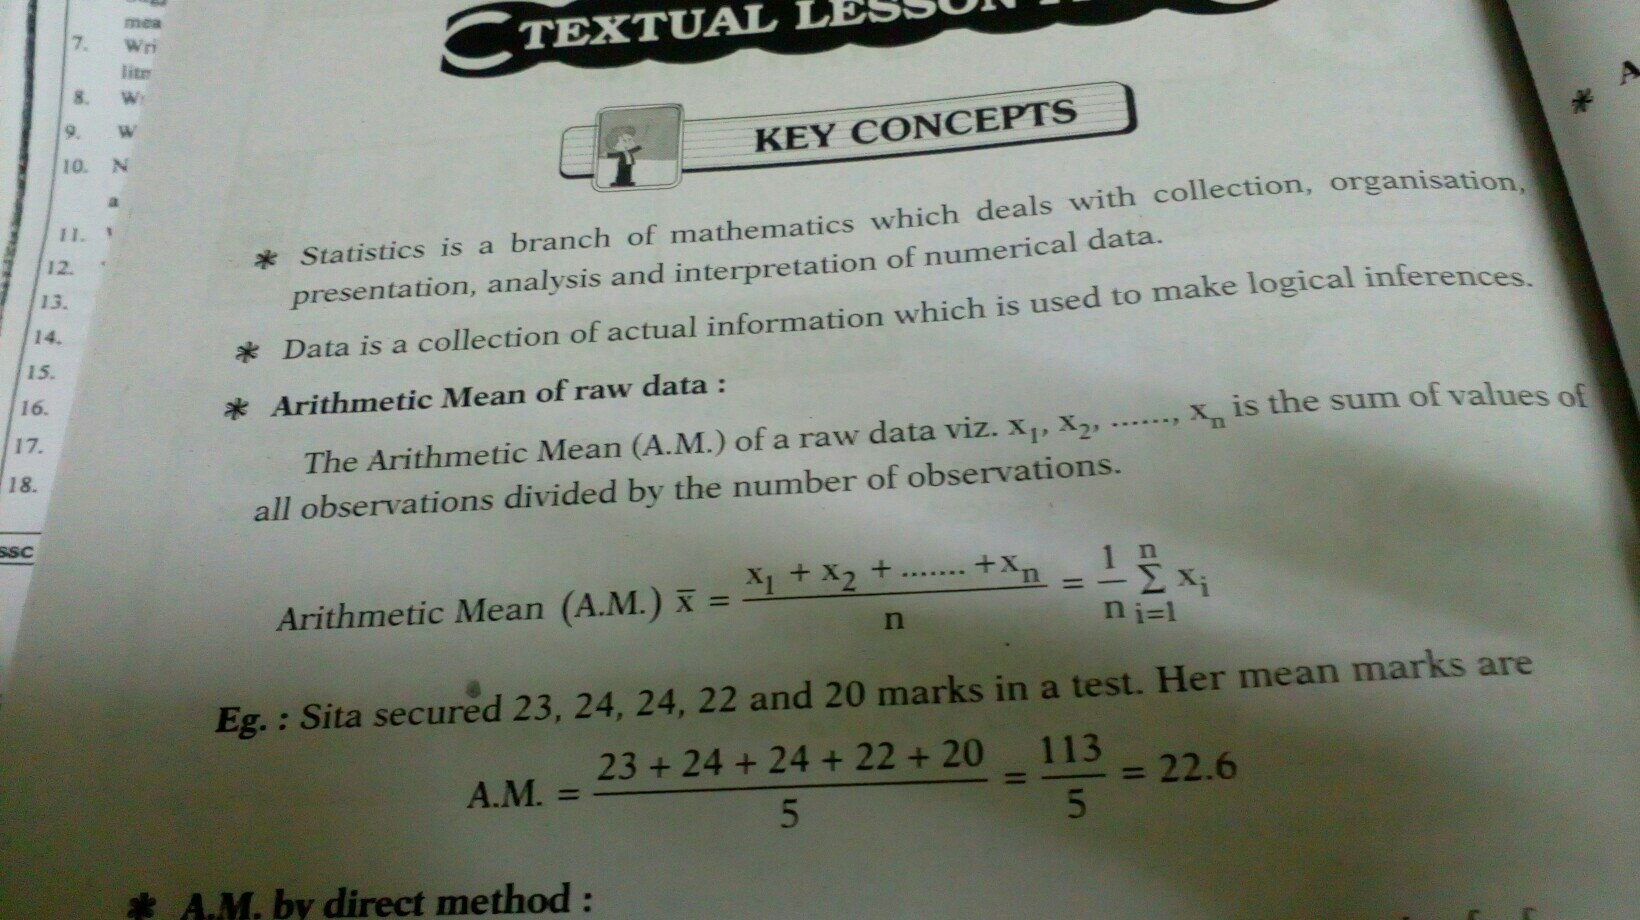 GIVE ME ALL FORMULA OF CLASS 10 MATHS CH 14 STATICS NO SPAM